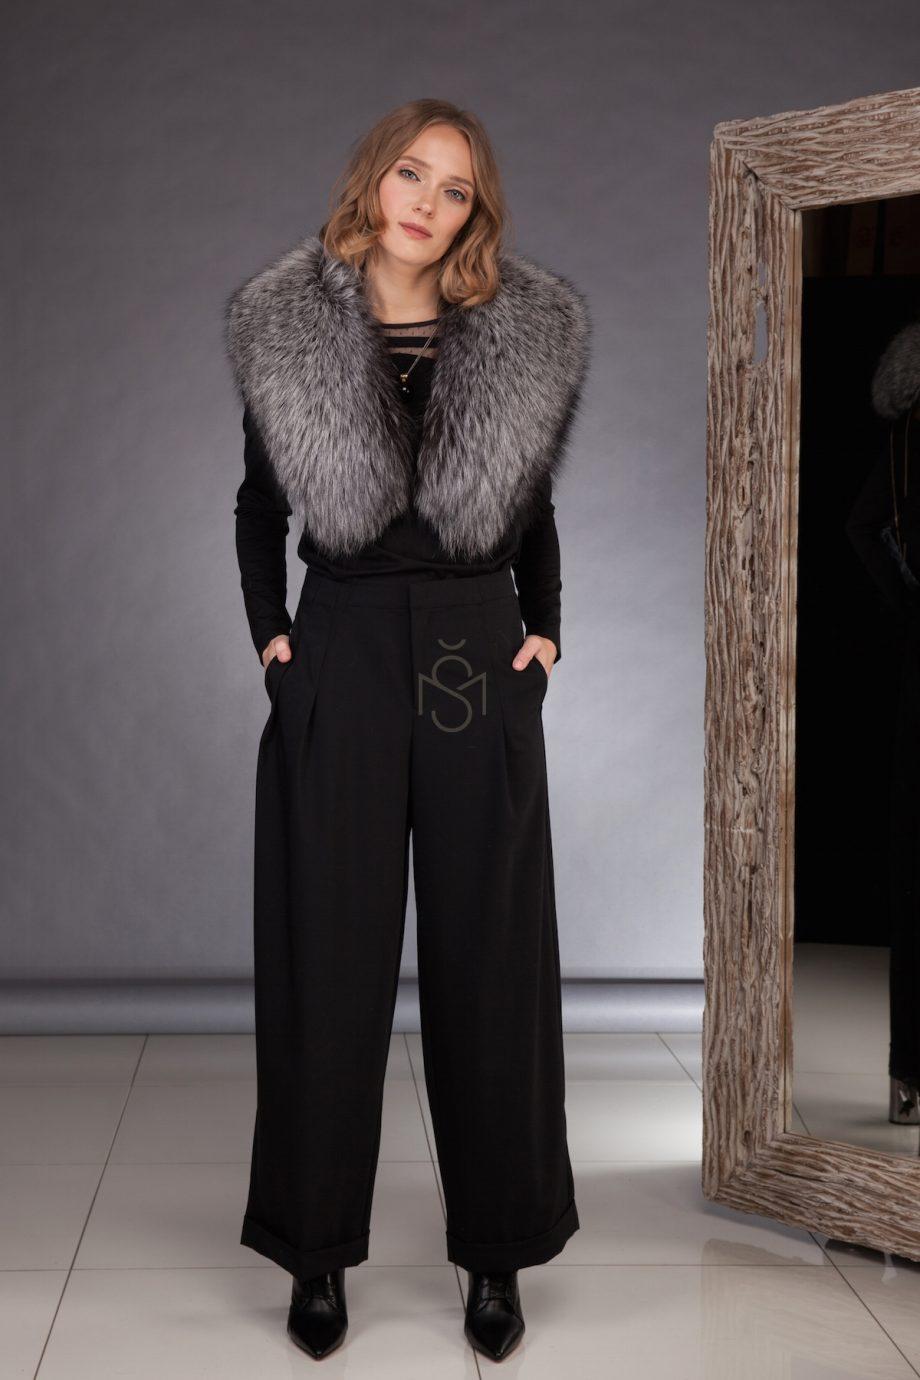 Silver fox fur collar, natural color made by SILTA MADA fur studio in Vilnius